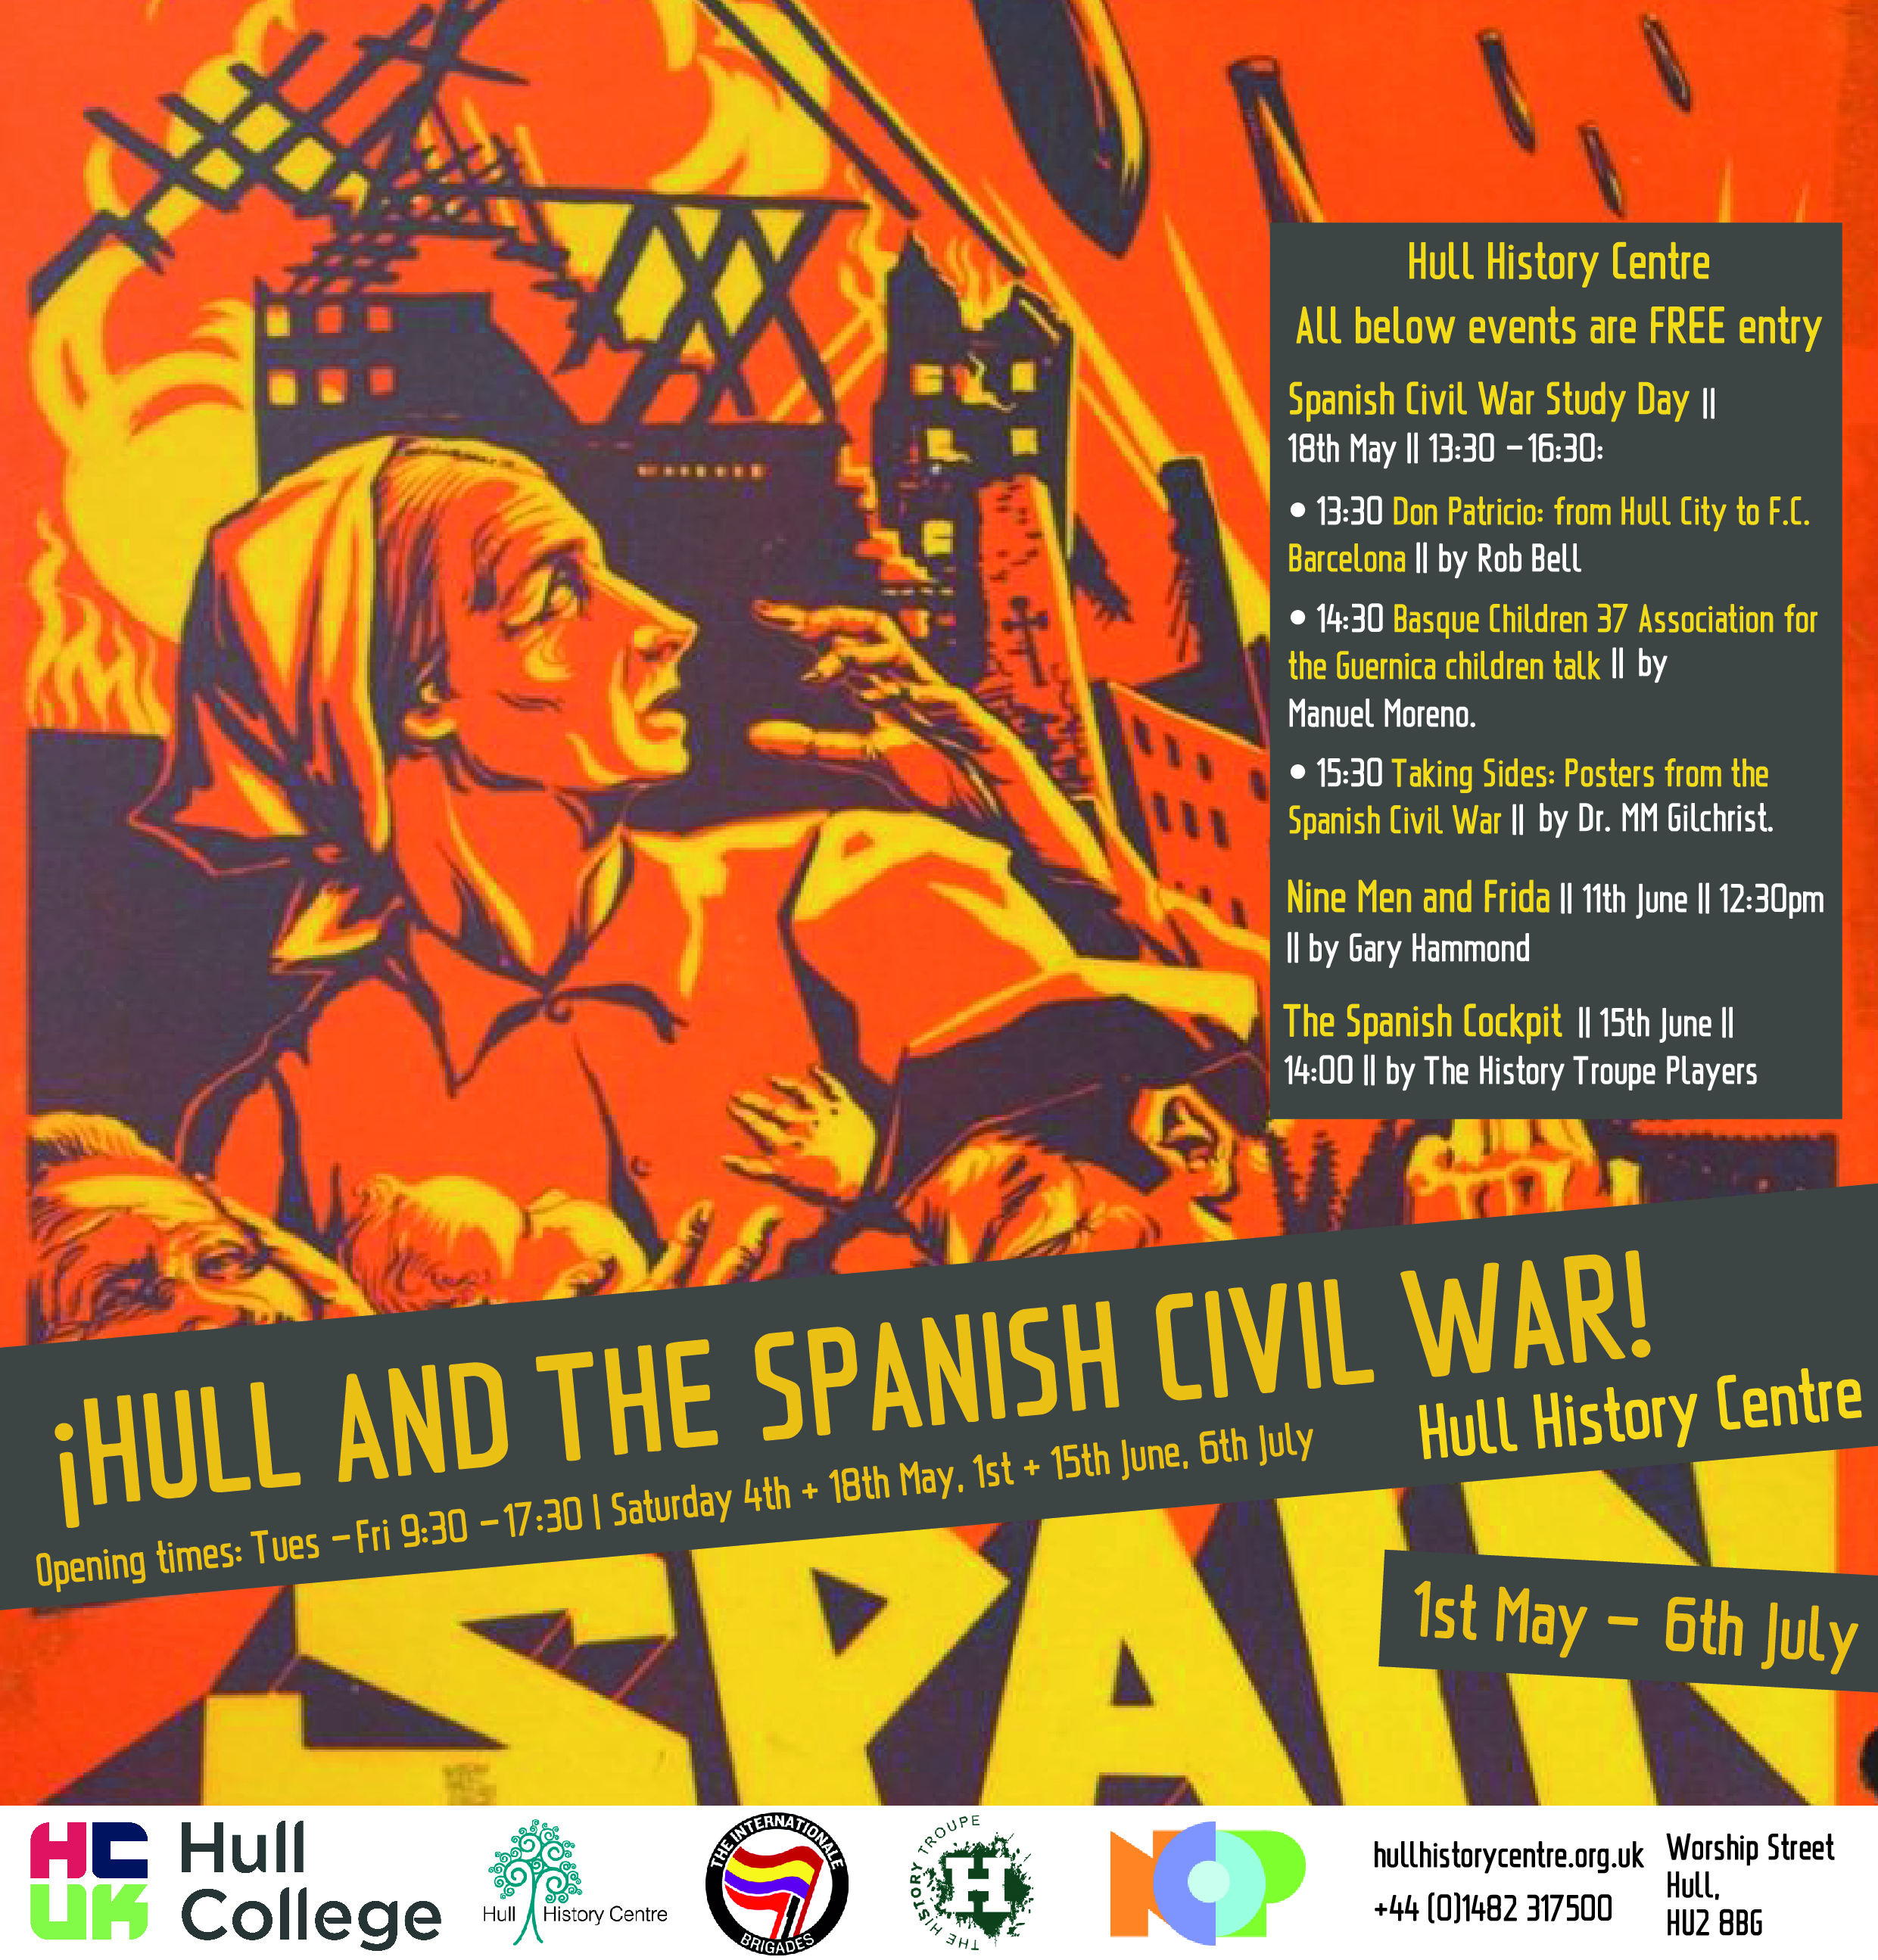 Hull and the Spanish Civil War HHC digital poster.jpg